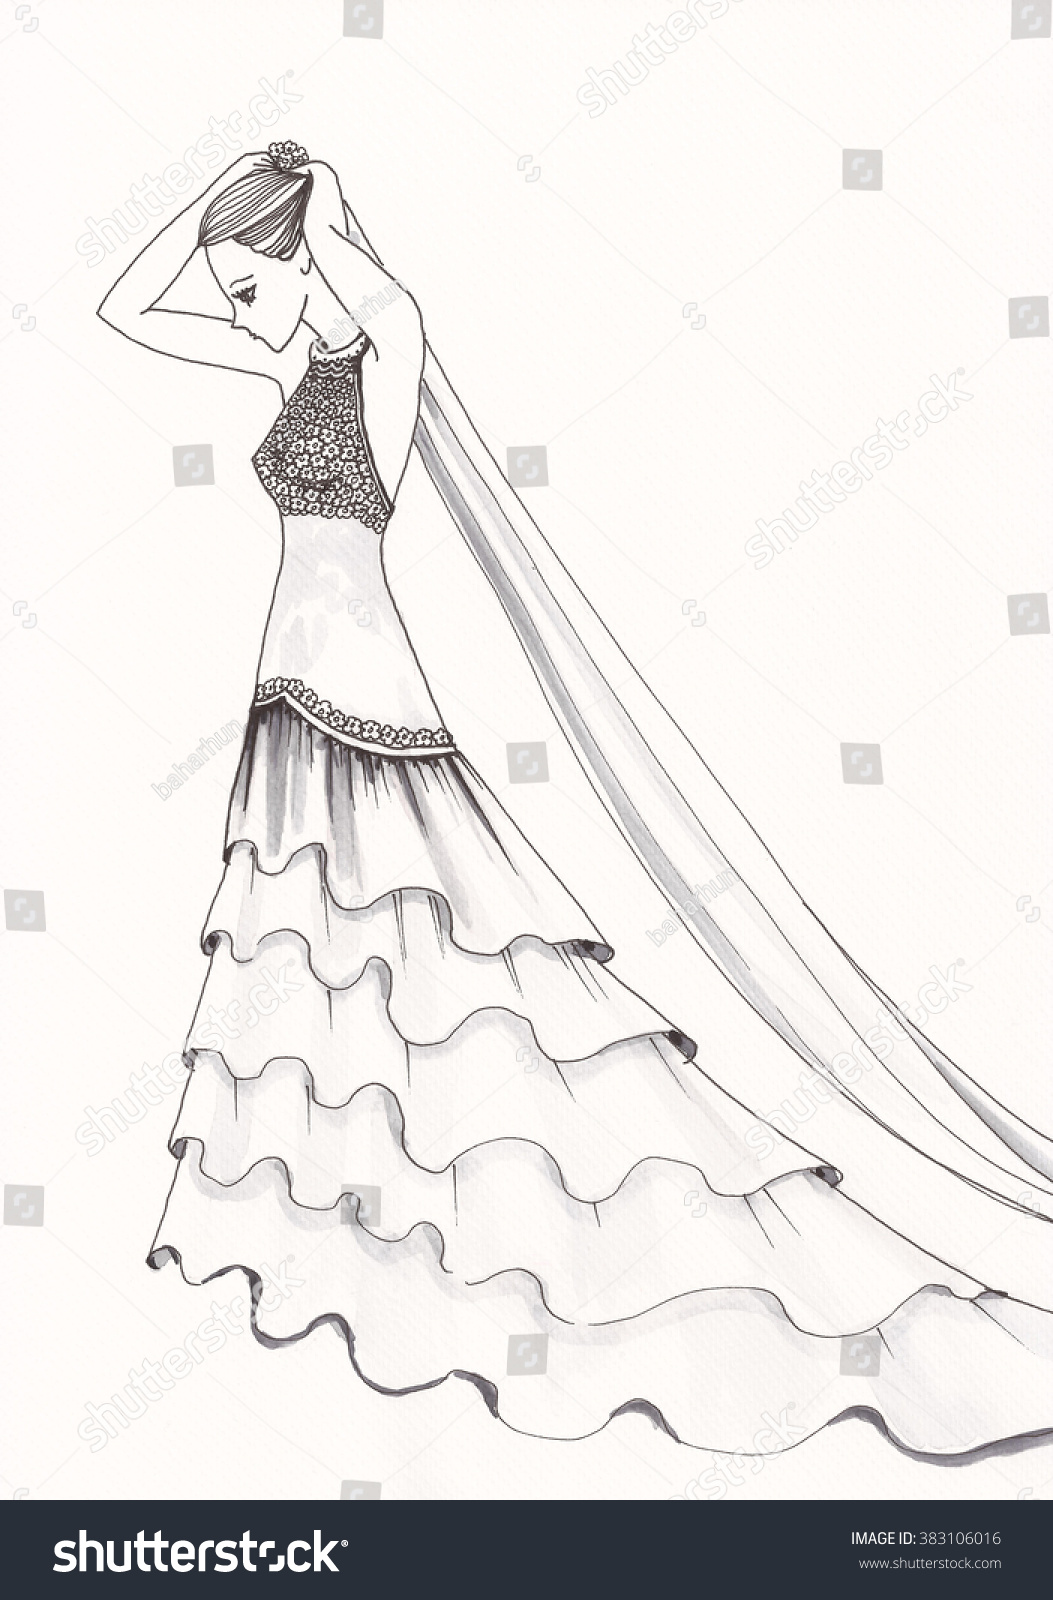 Pencil sketch dress design